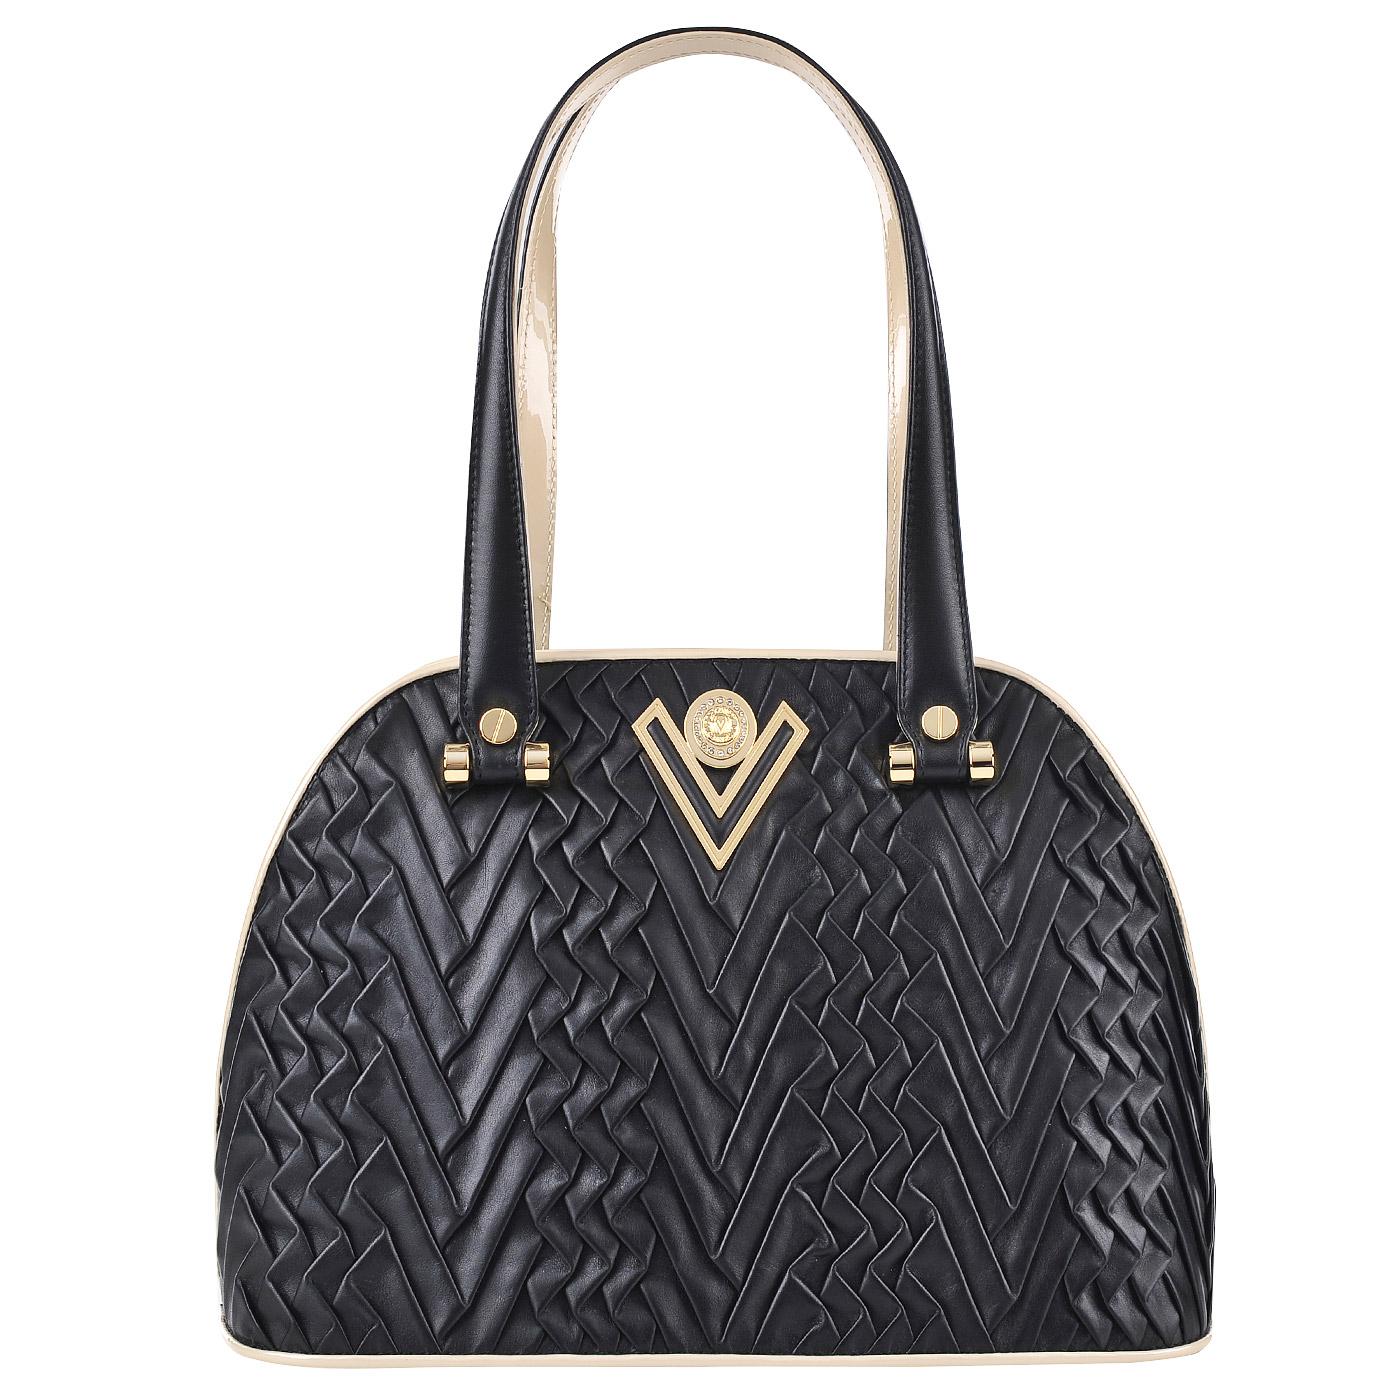 e29f4d063fc8 Женская кожаная сумка Valentino Orlandi Jaly 5153_nero ...